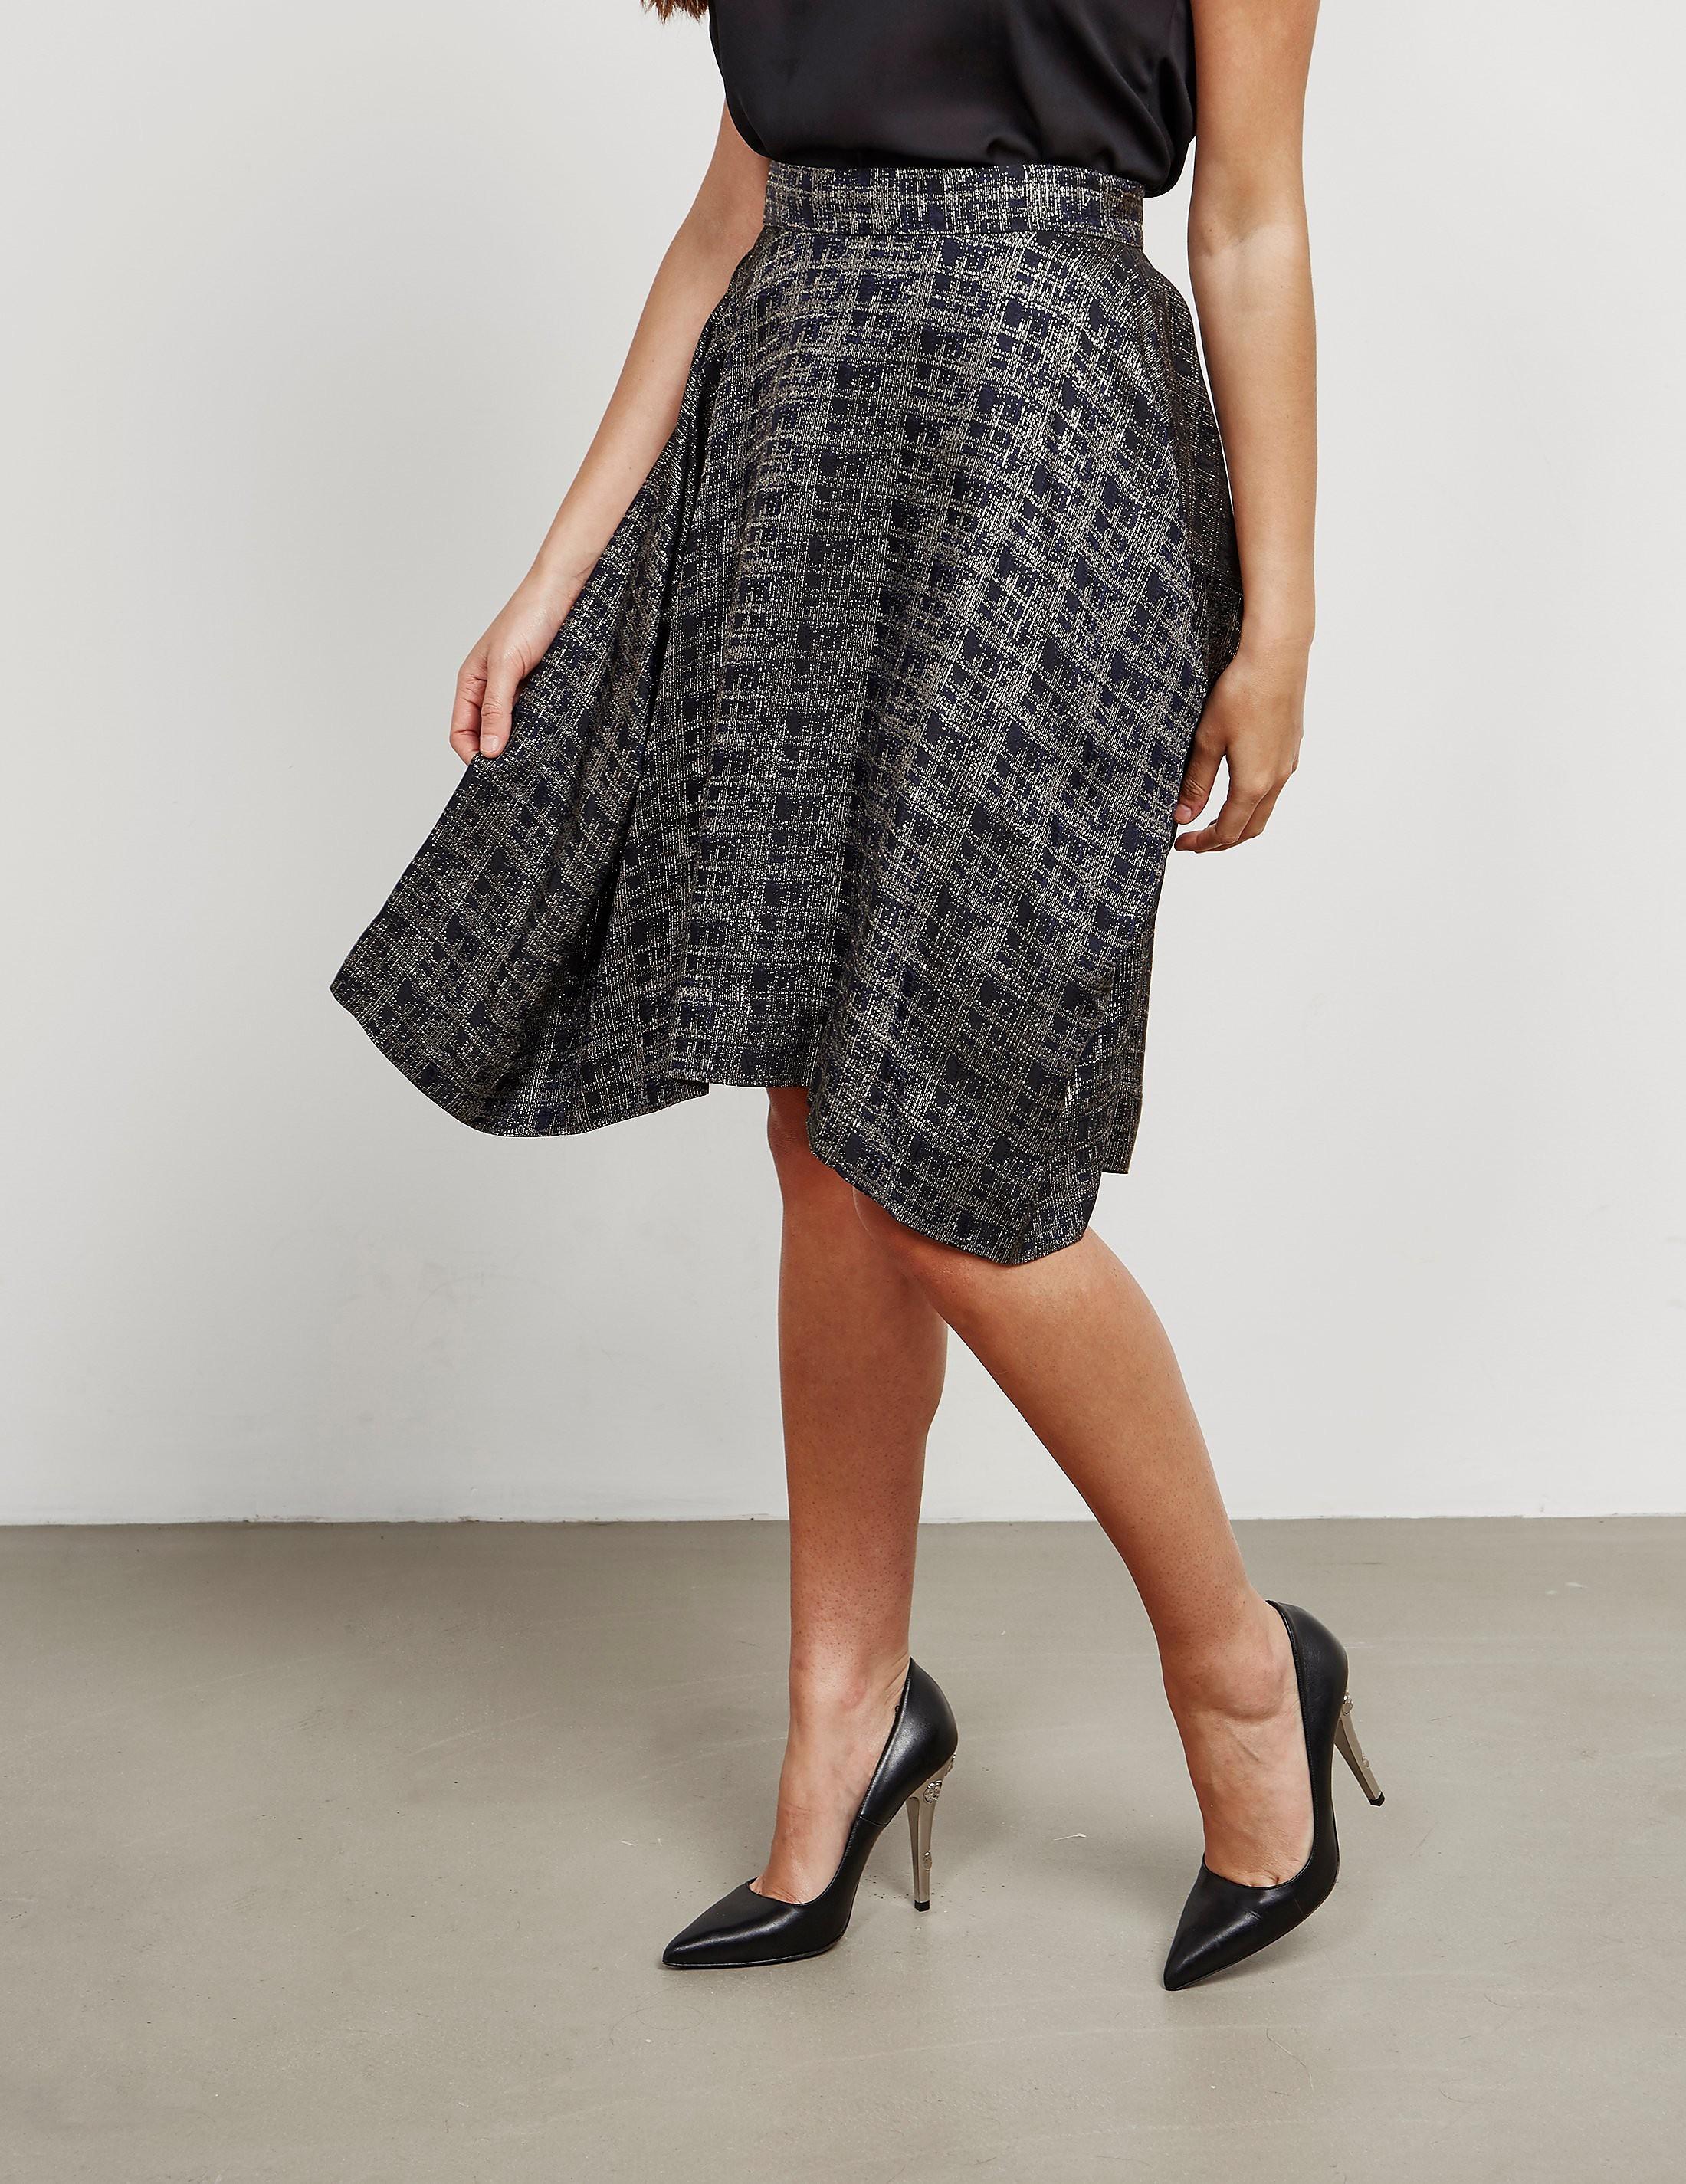 Vivienne Westwood Anglomania Kite Skirt